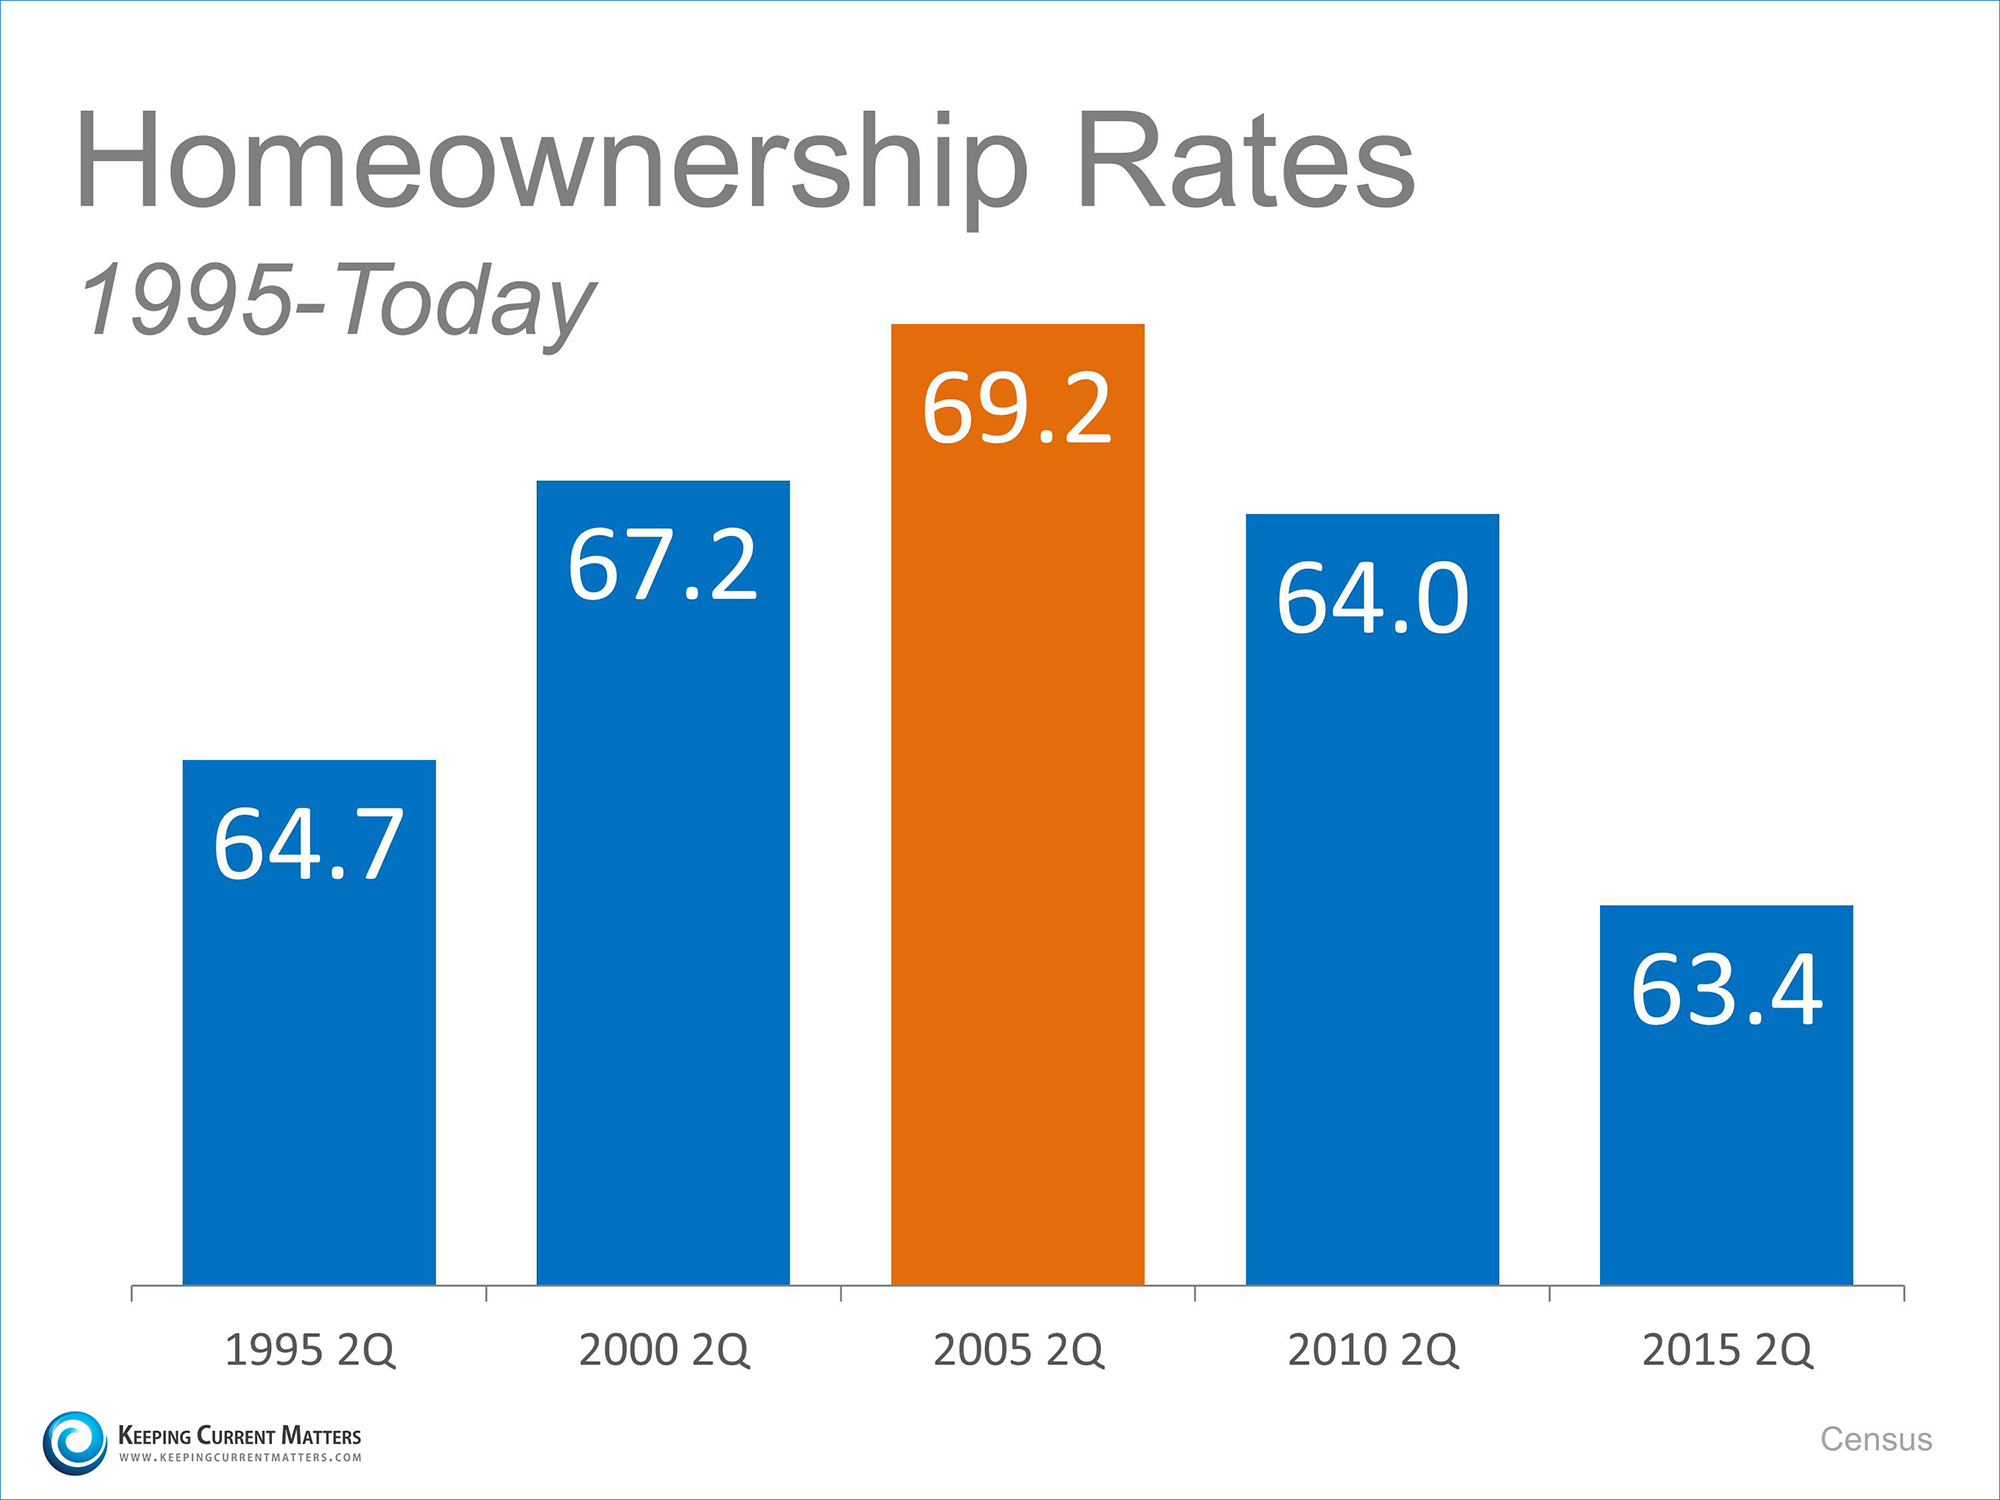 HomeownershipRates | Keeping Current Matters